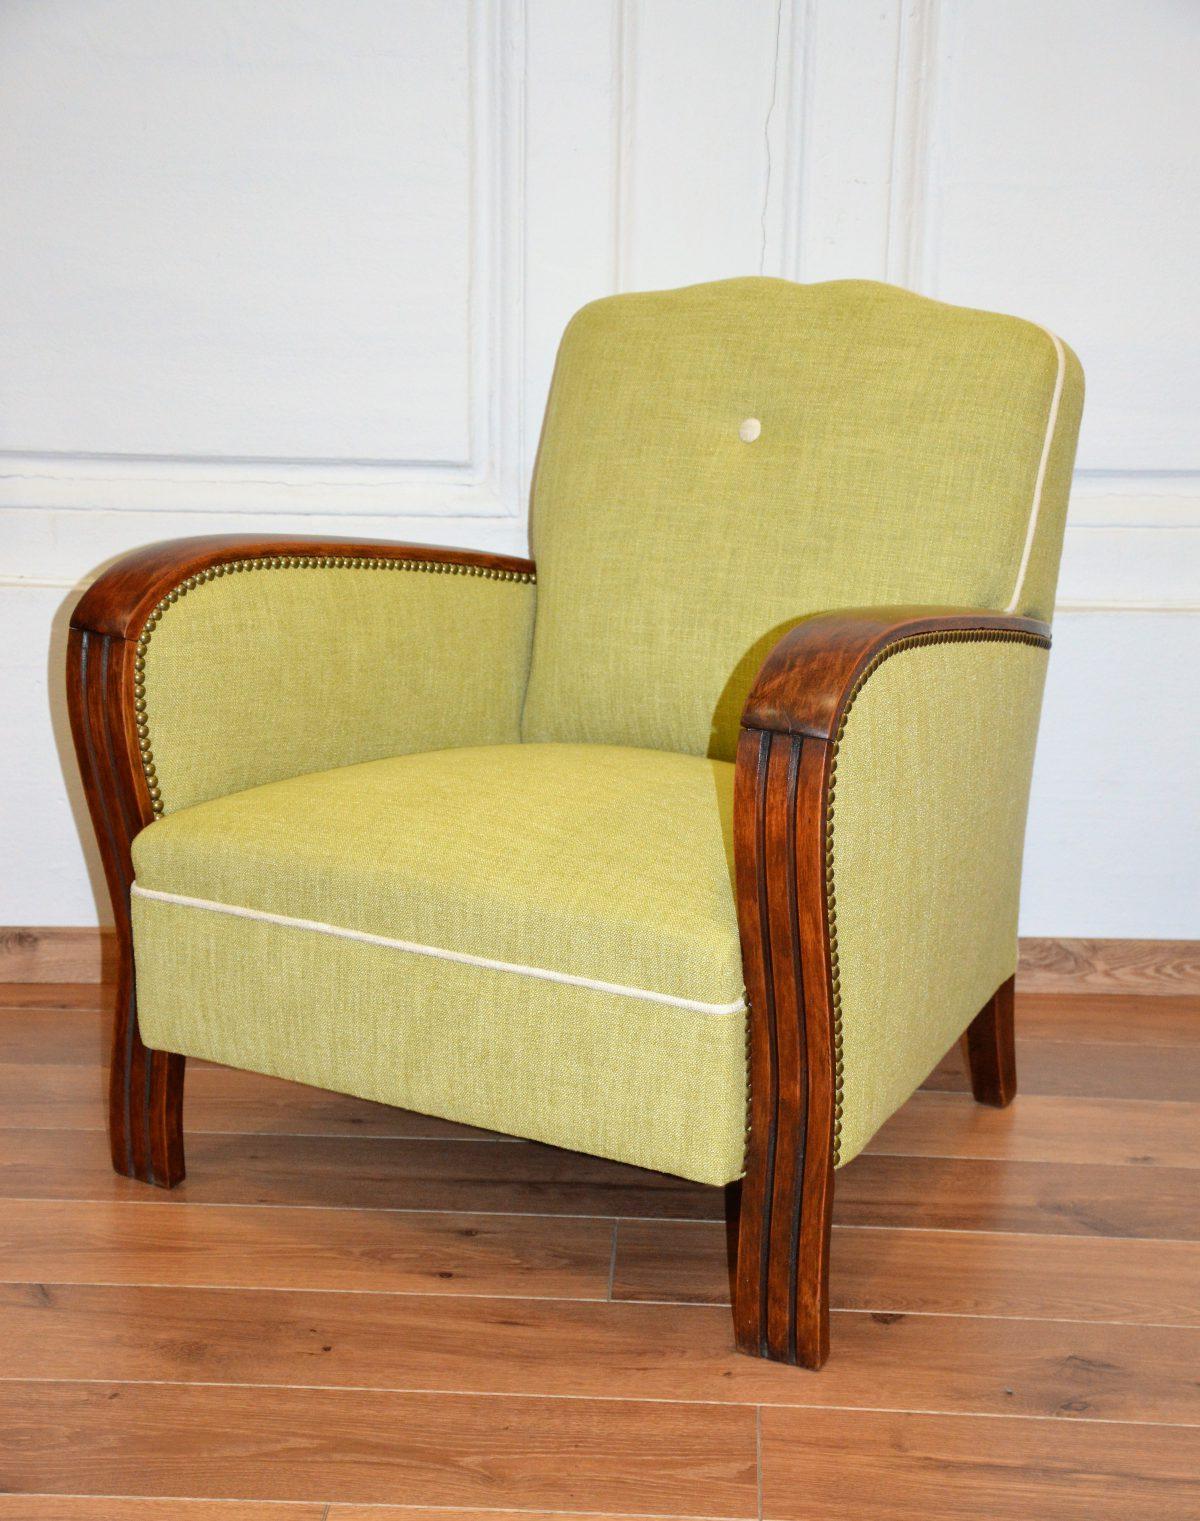 tapissier d corateur besan on bouvard tapissier d corateur besan on. Black Bedroom Furniture Sets. Home Design Ideas